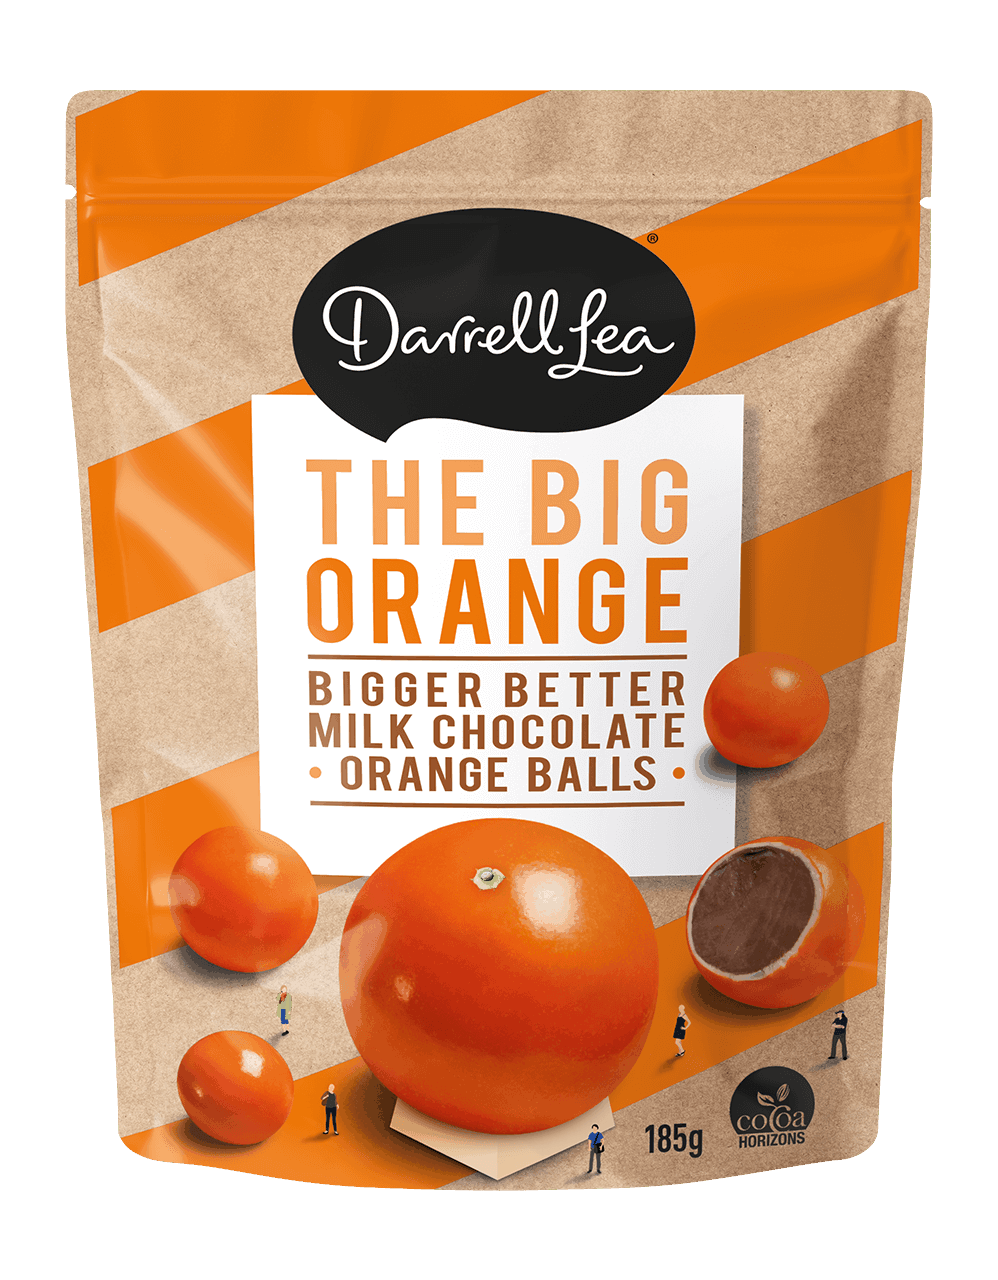 Image of The Big Orange CHOCOLATE BITES 160g